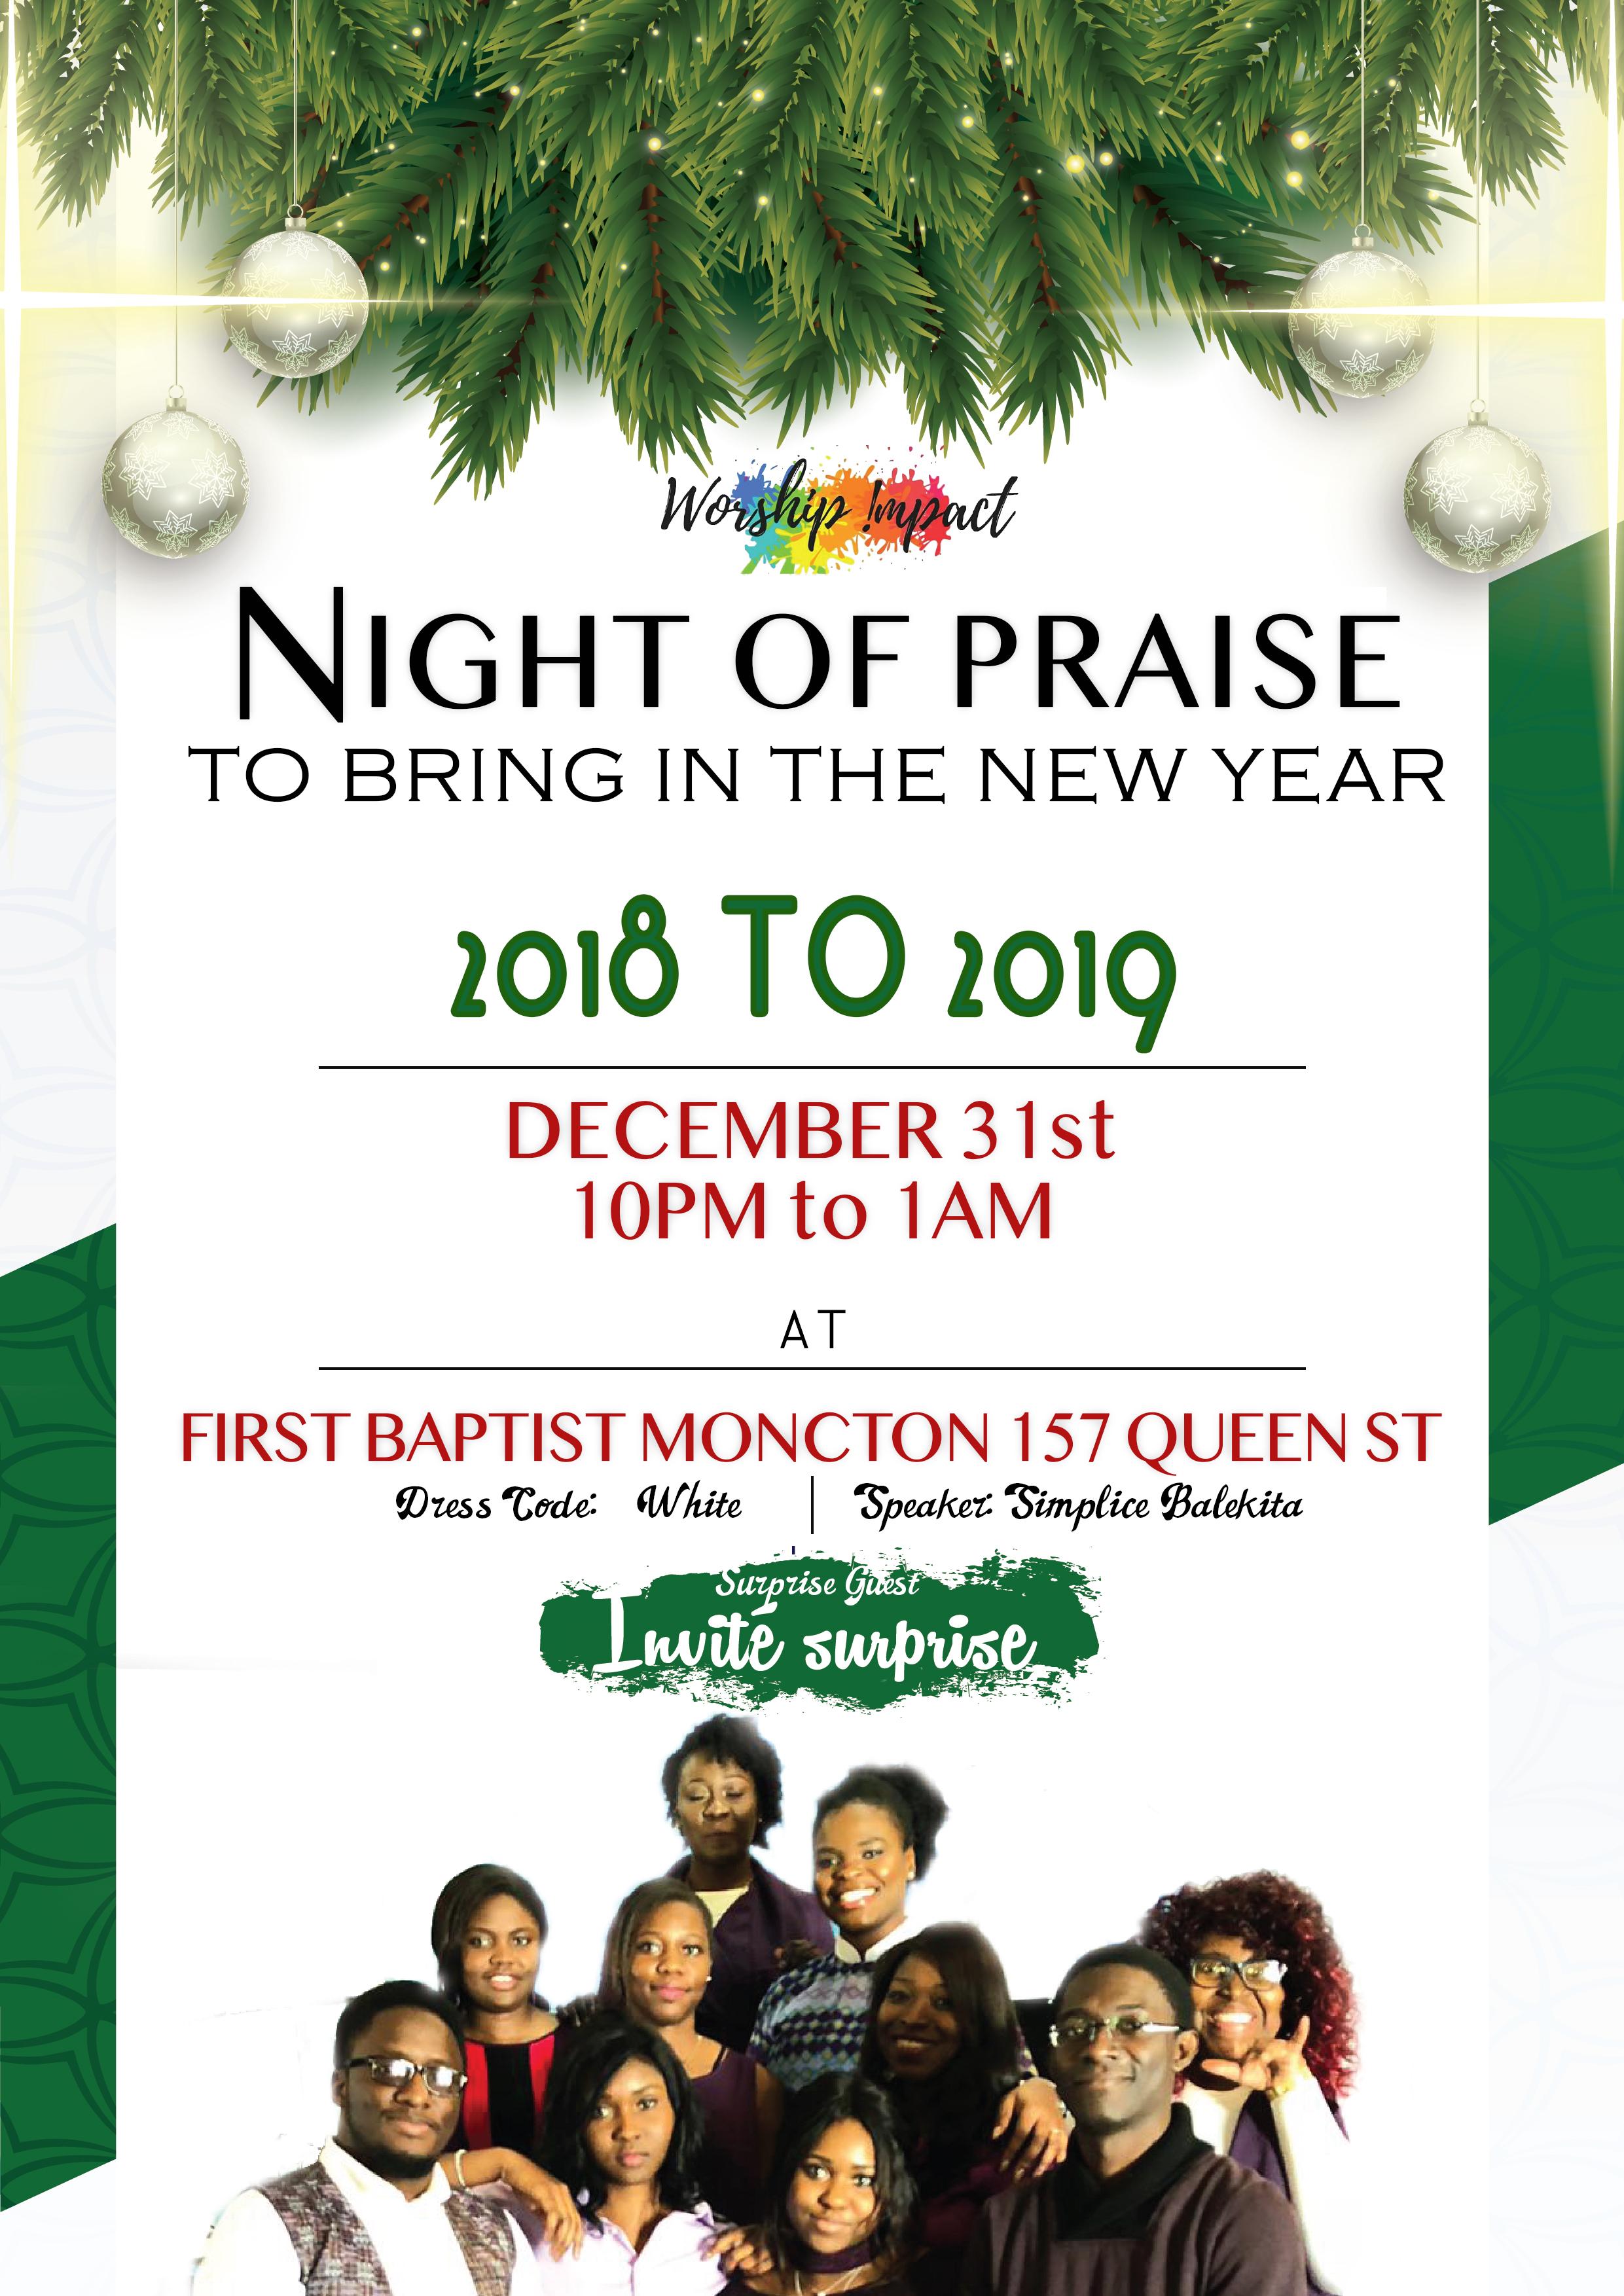 Night of Praise Dec 31 2018 Poster.jpg